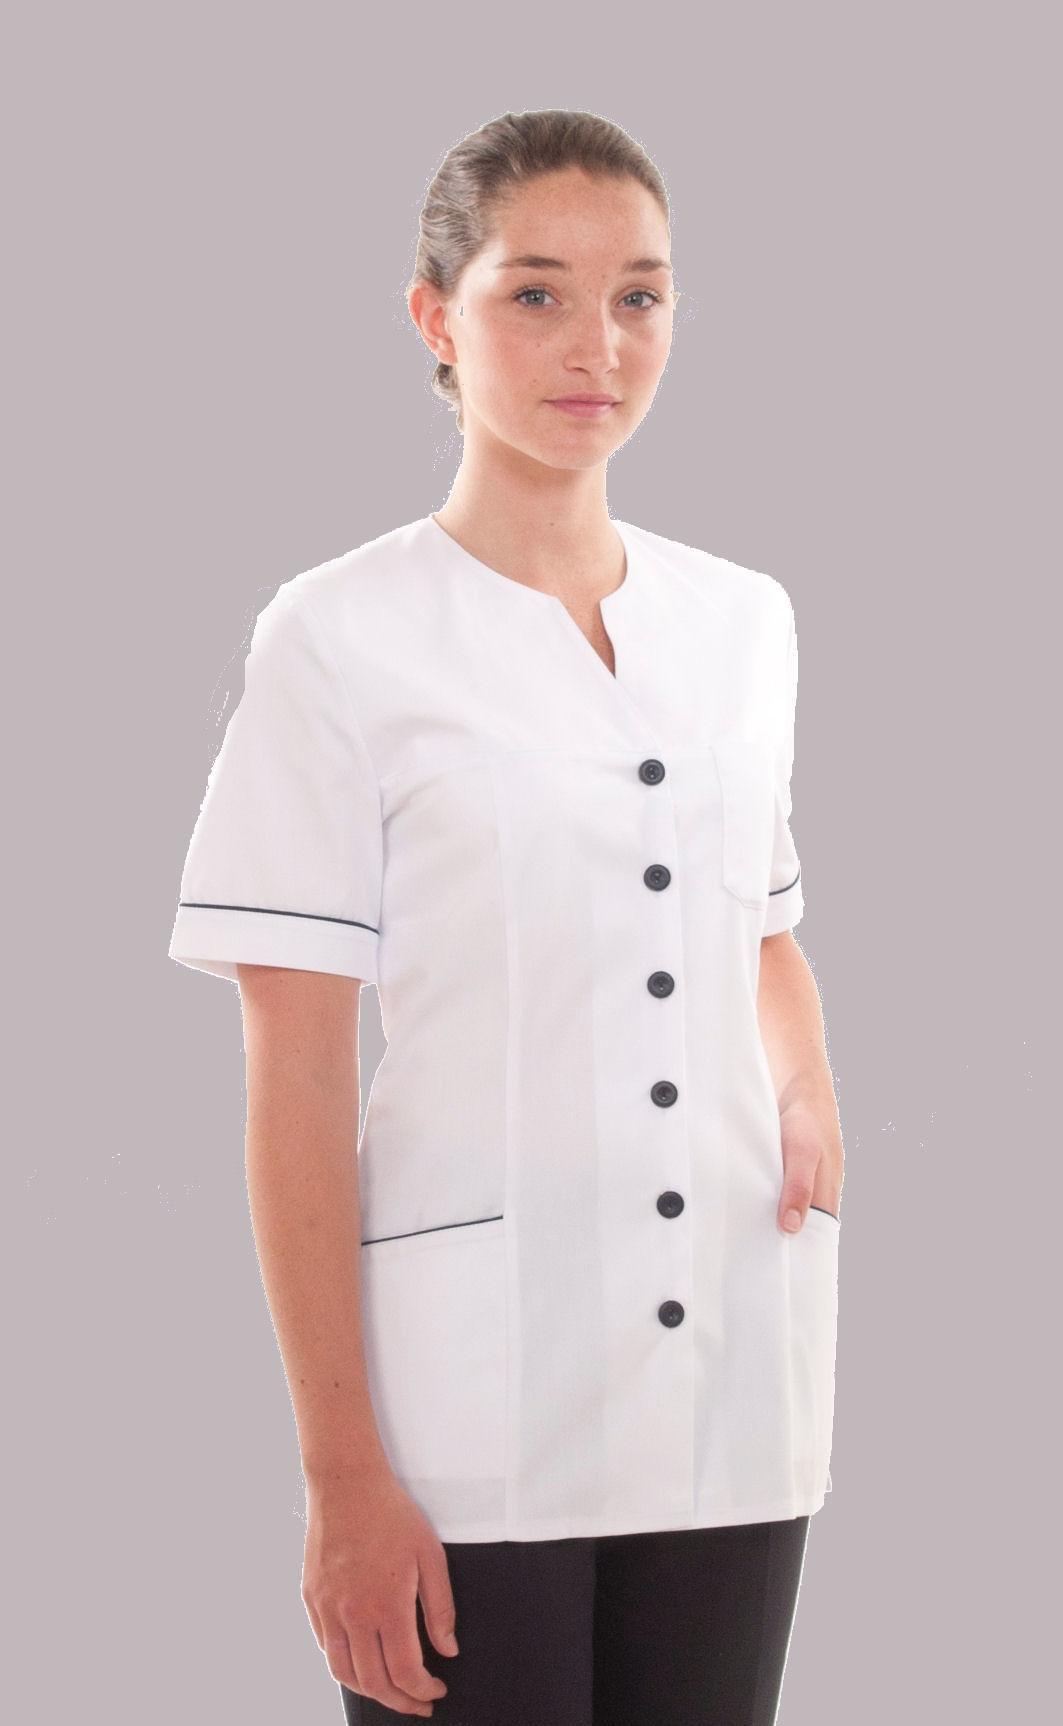 883572e63b0 Nurses uniform high neckline (NT100) - Coppingers - Uniform Specialists